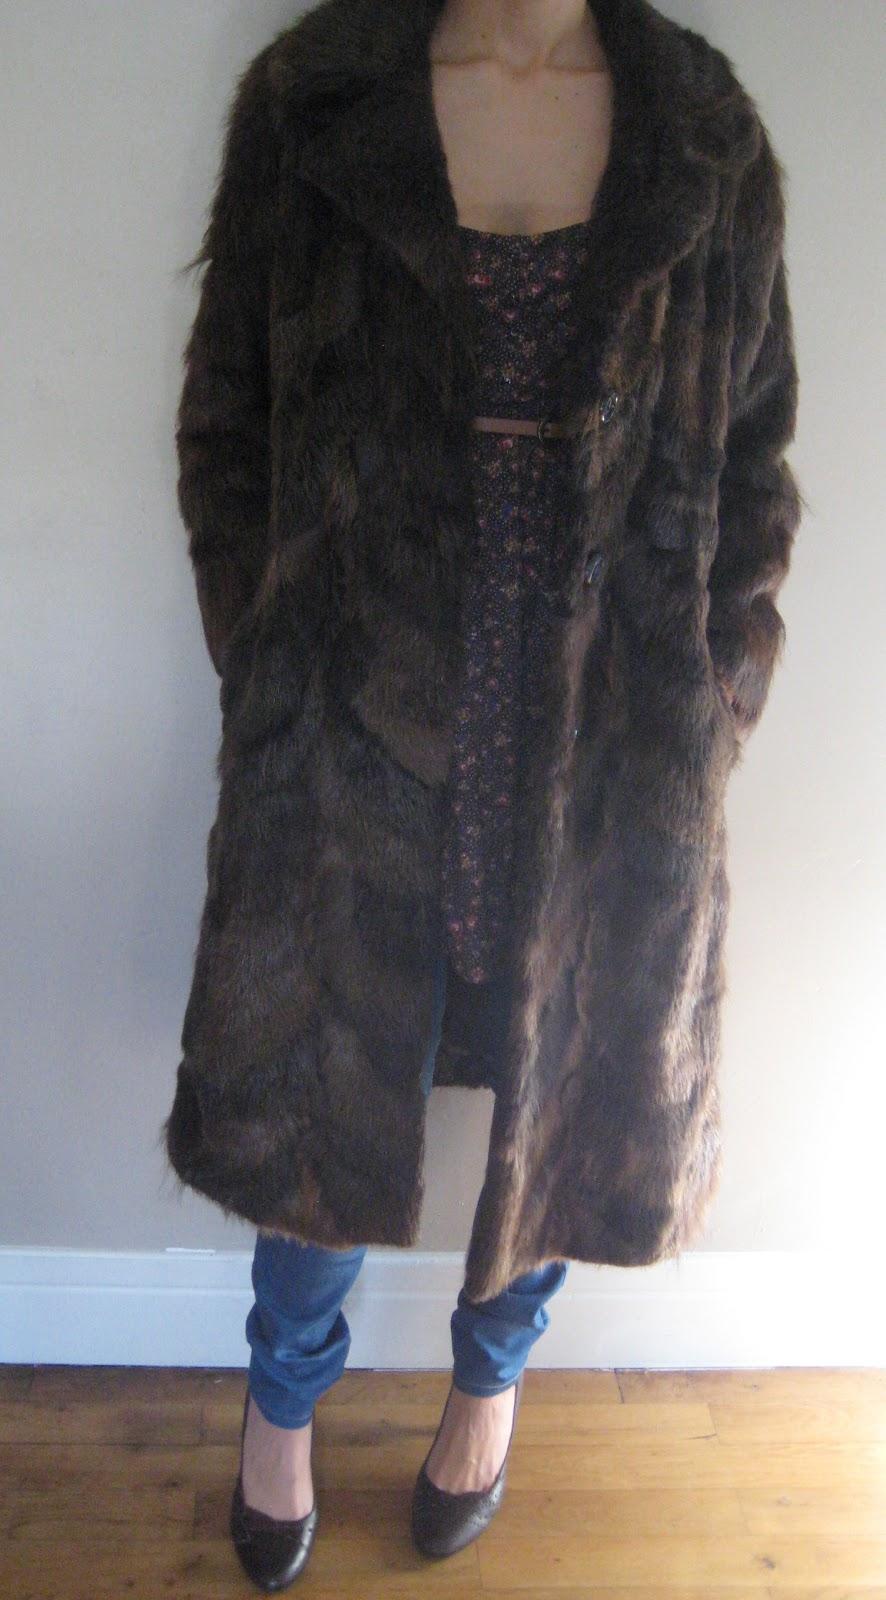 cloz sweet cloz manteau fourrure vintage. Black Bedroom Furniture Sets. Home Design Ideas